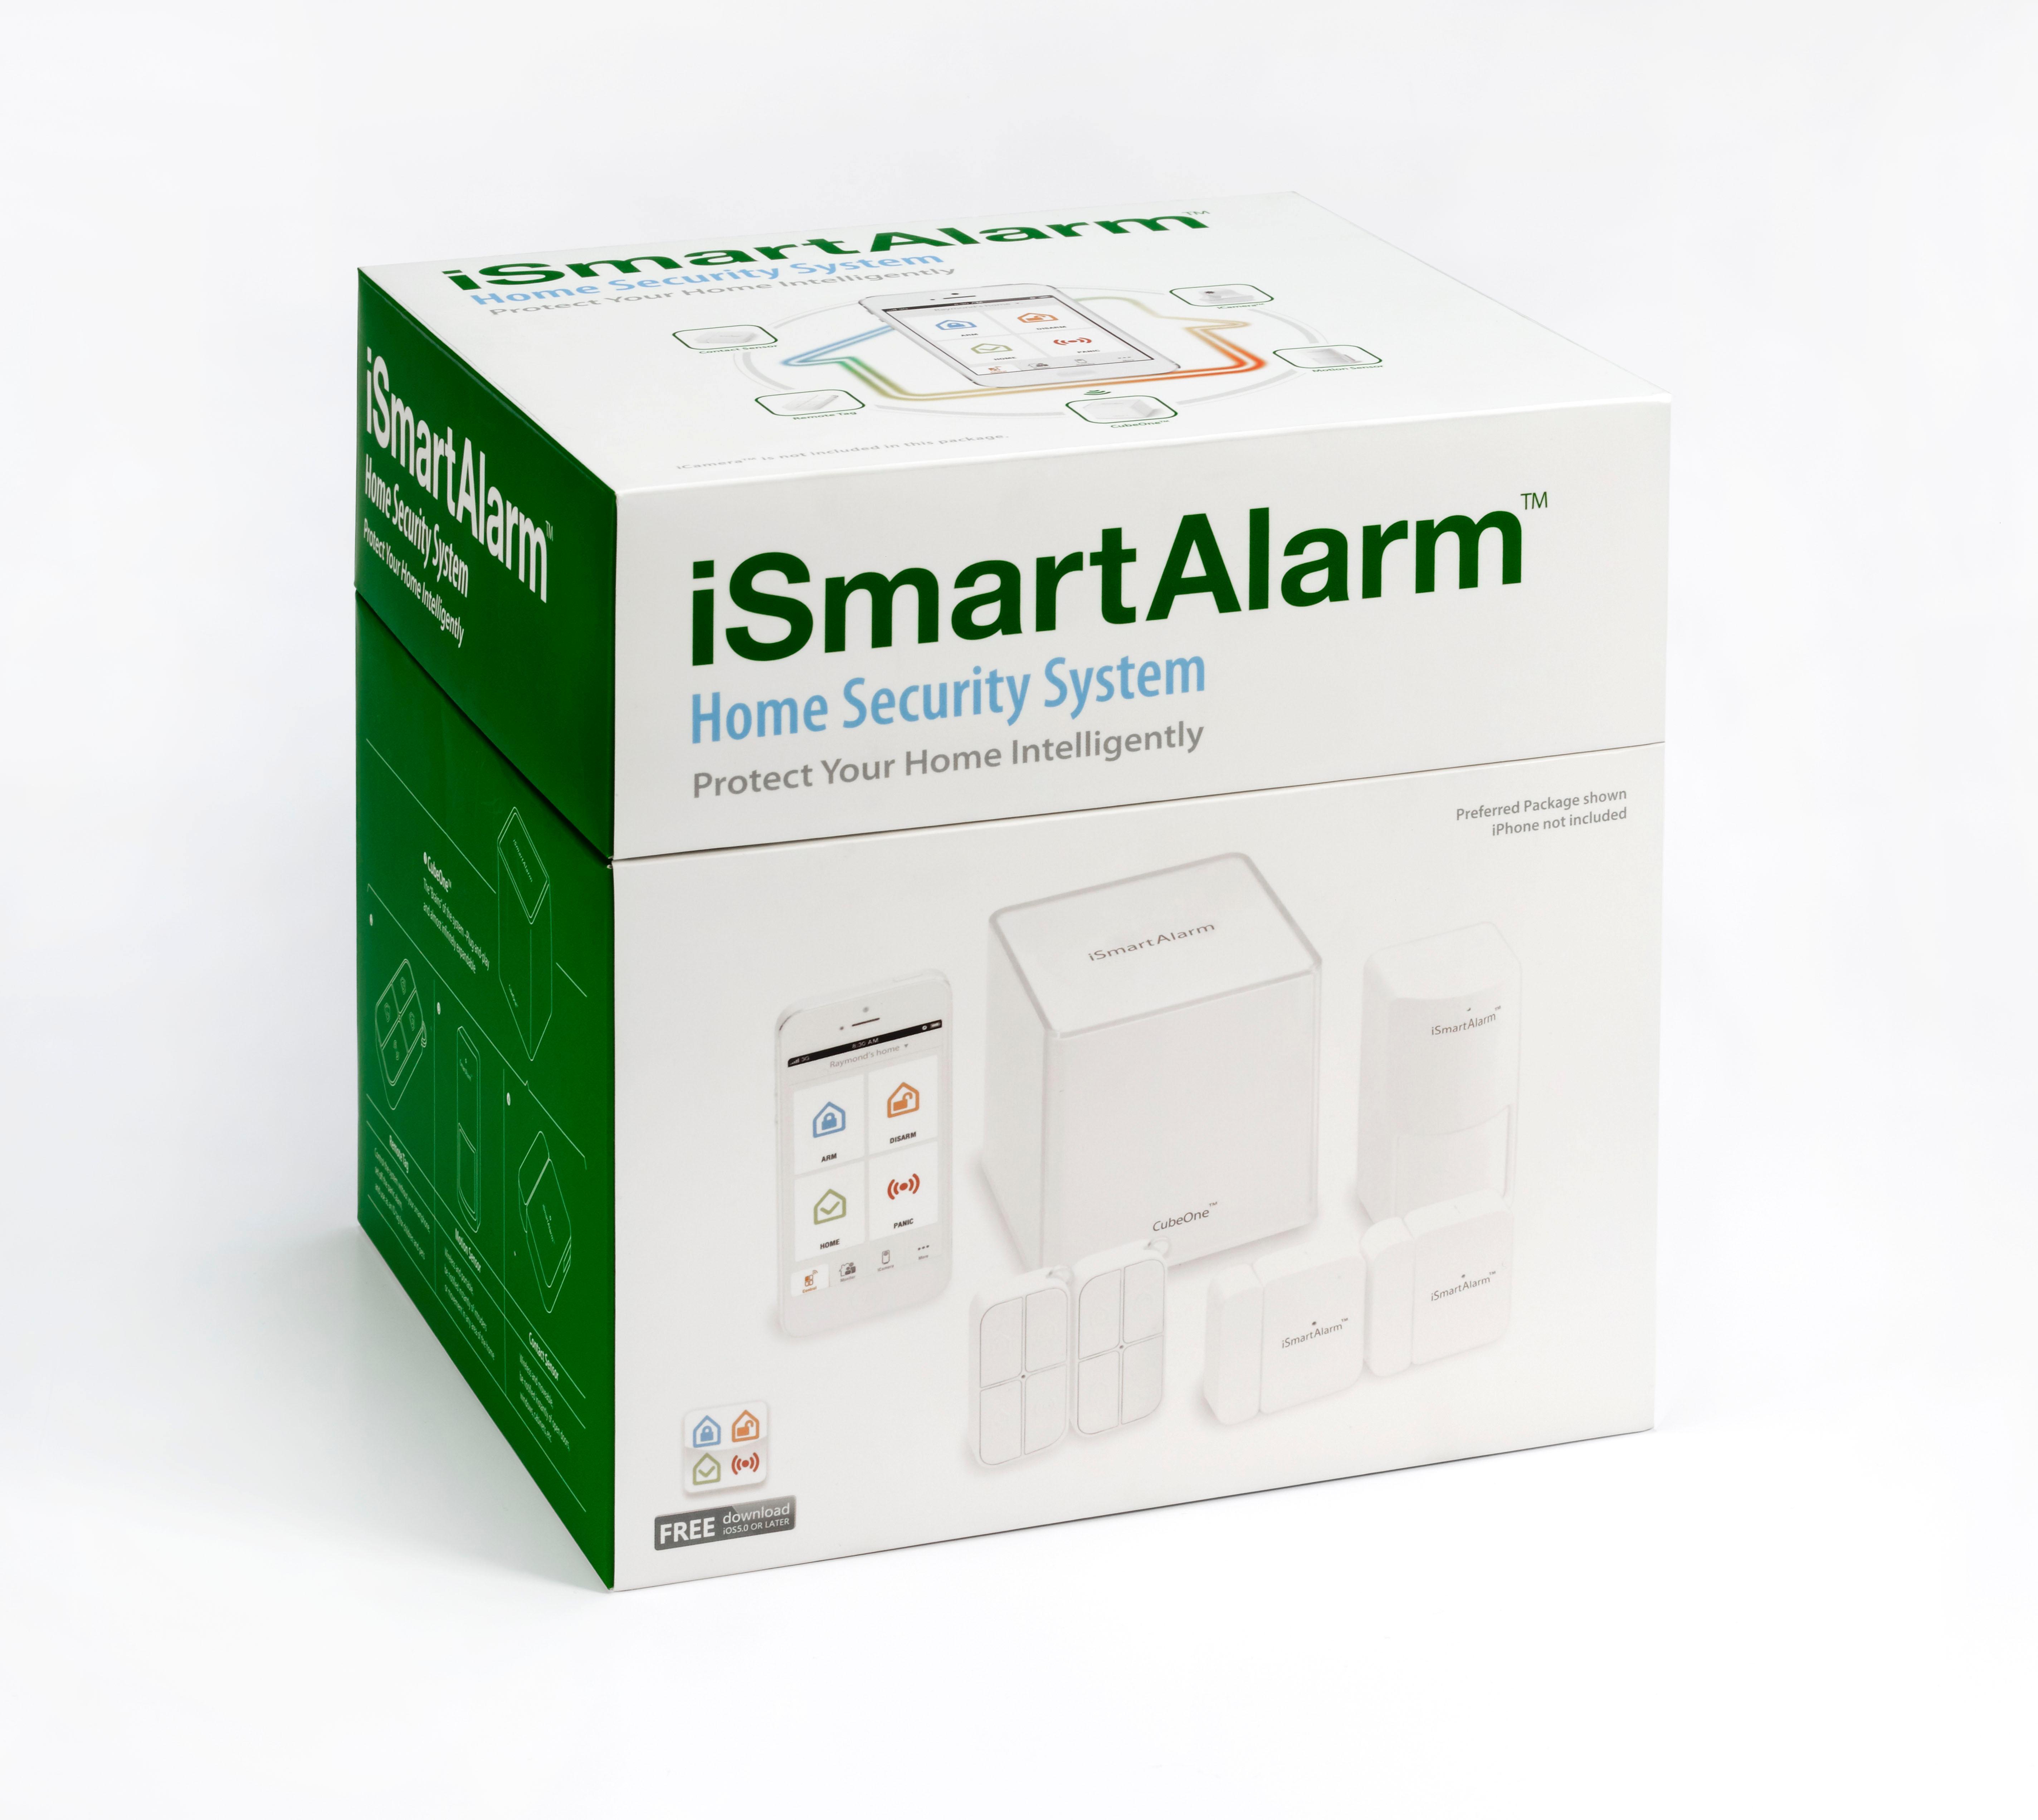 ismartalarm preferred package berwachungssystem baumarkt. Black Bedroom Furniture Sets. Home Design Ideas